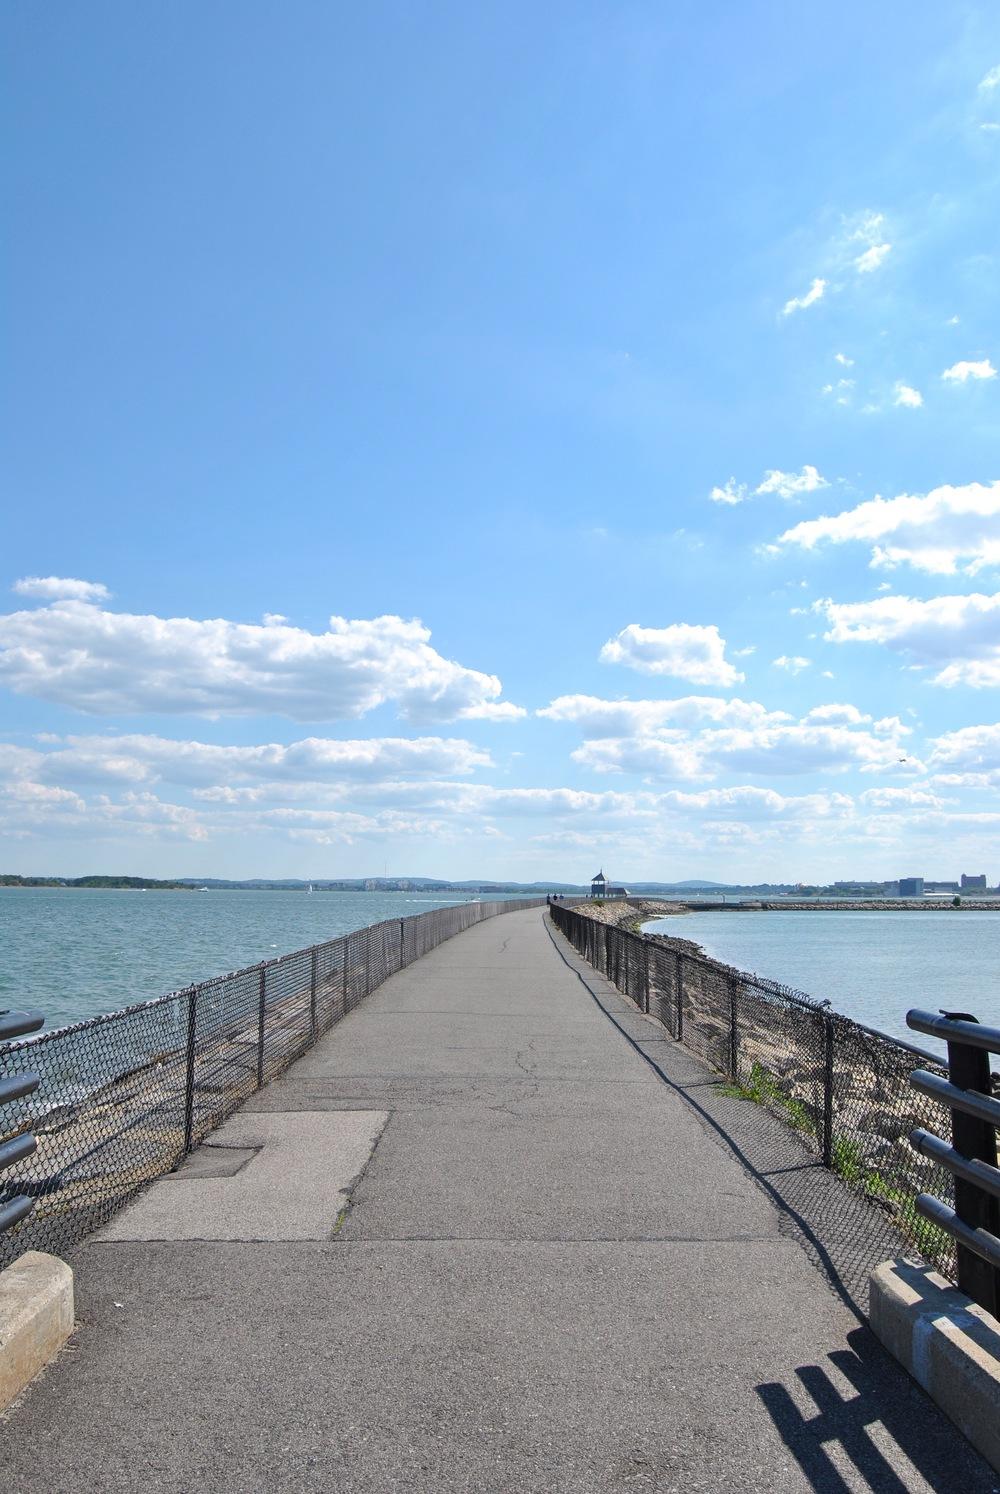 Walking along the harborwalk made Boston Harbour look like a veritable oasis.